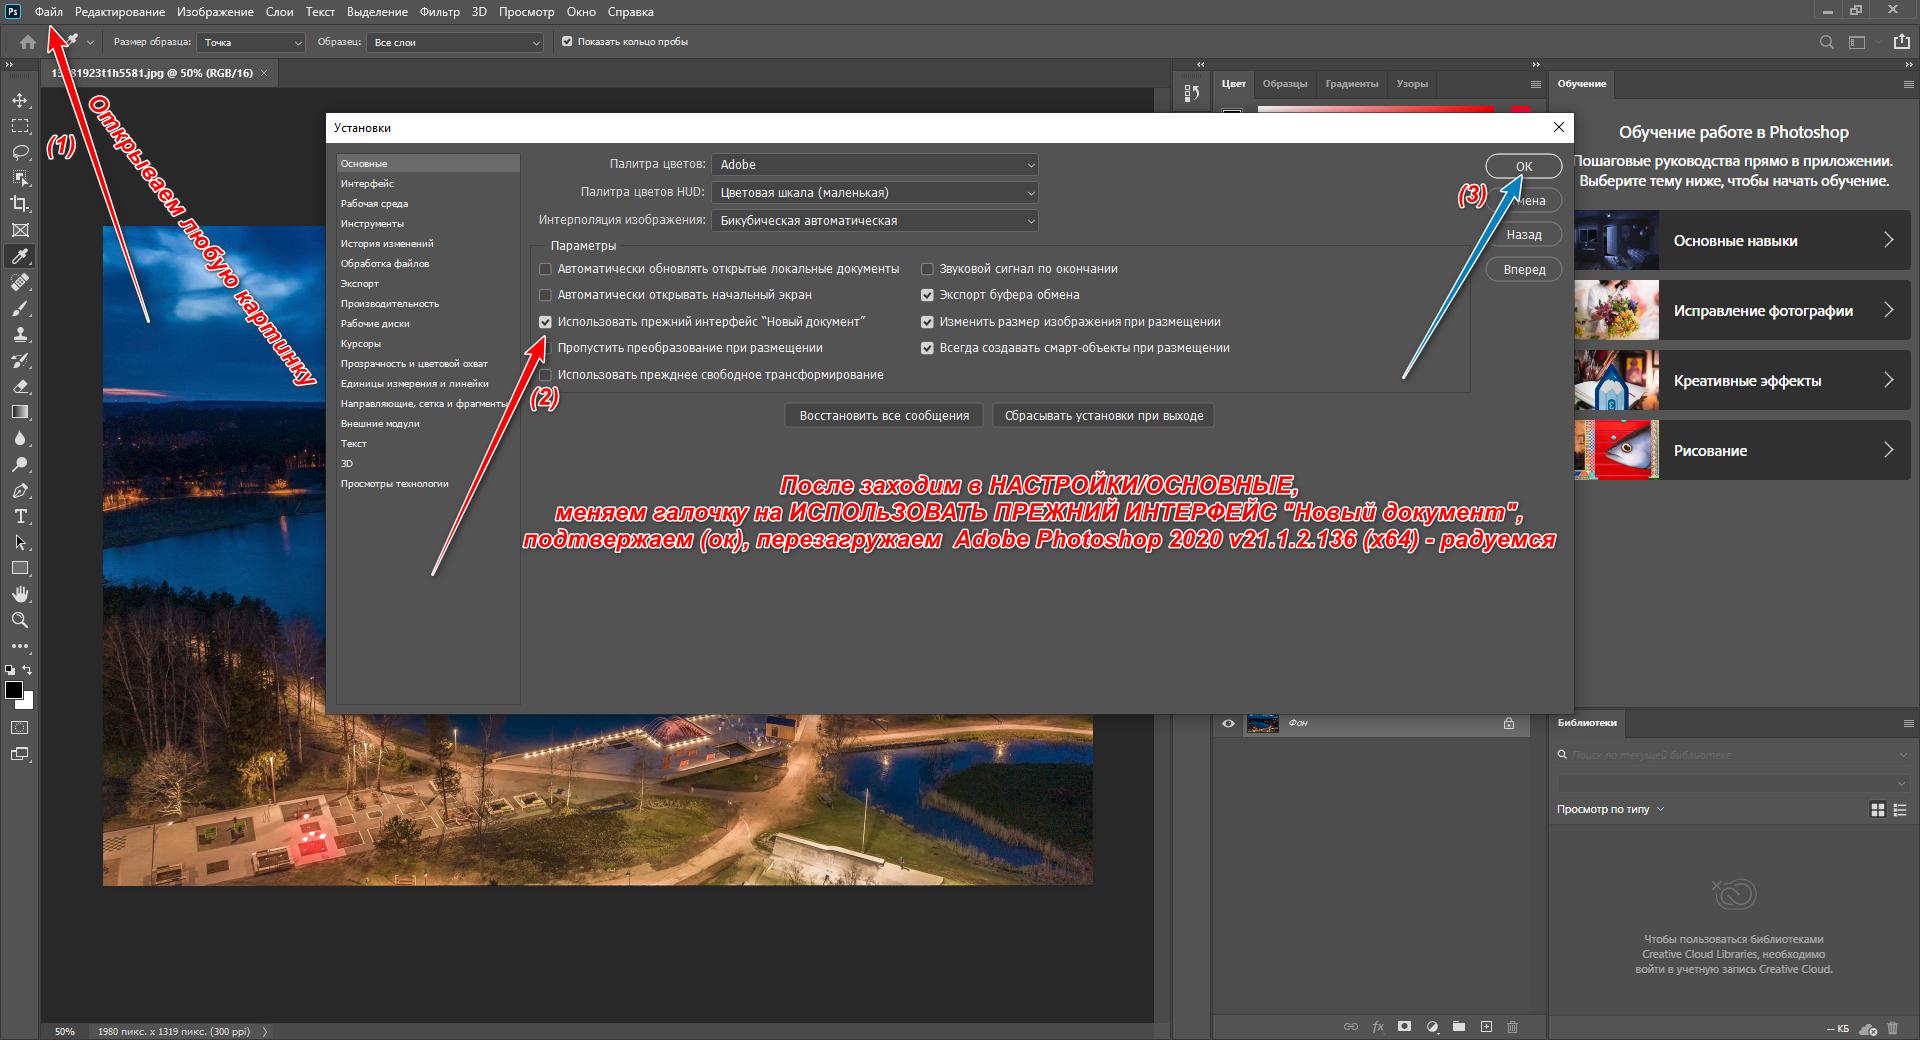 Adobe Photoshop 2020 v21.1.2.136 (x64) RePack (2020) Multi/Русский